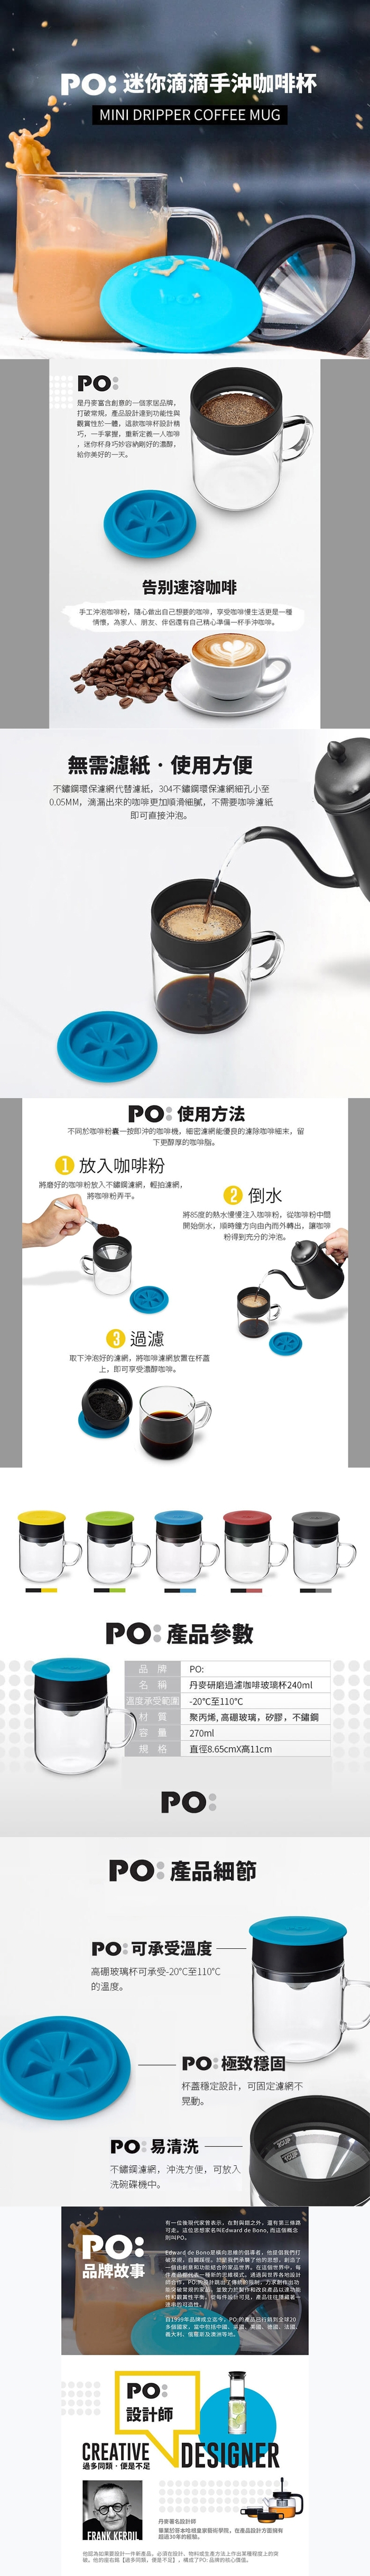 PO:Selected 丹麥DIY手沖咖啡二件組(手沖咖啡壺-灰/咖啡玻璃杯240ml-紅)